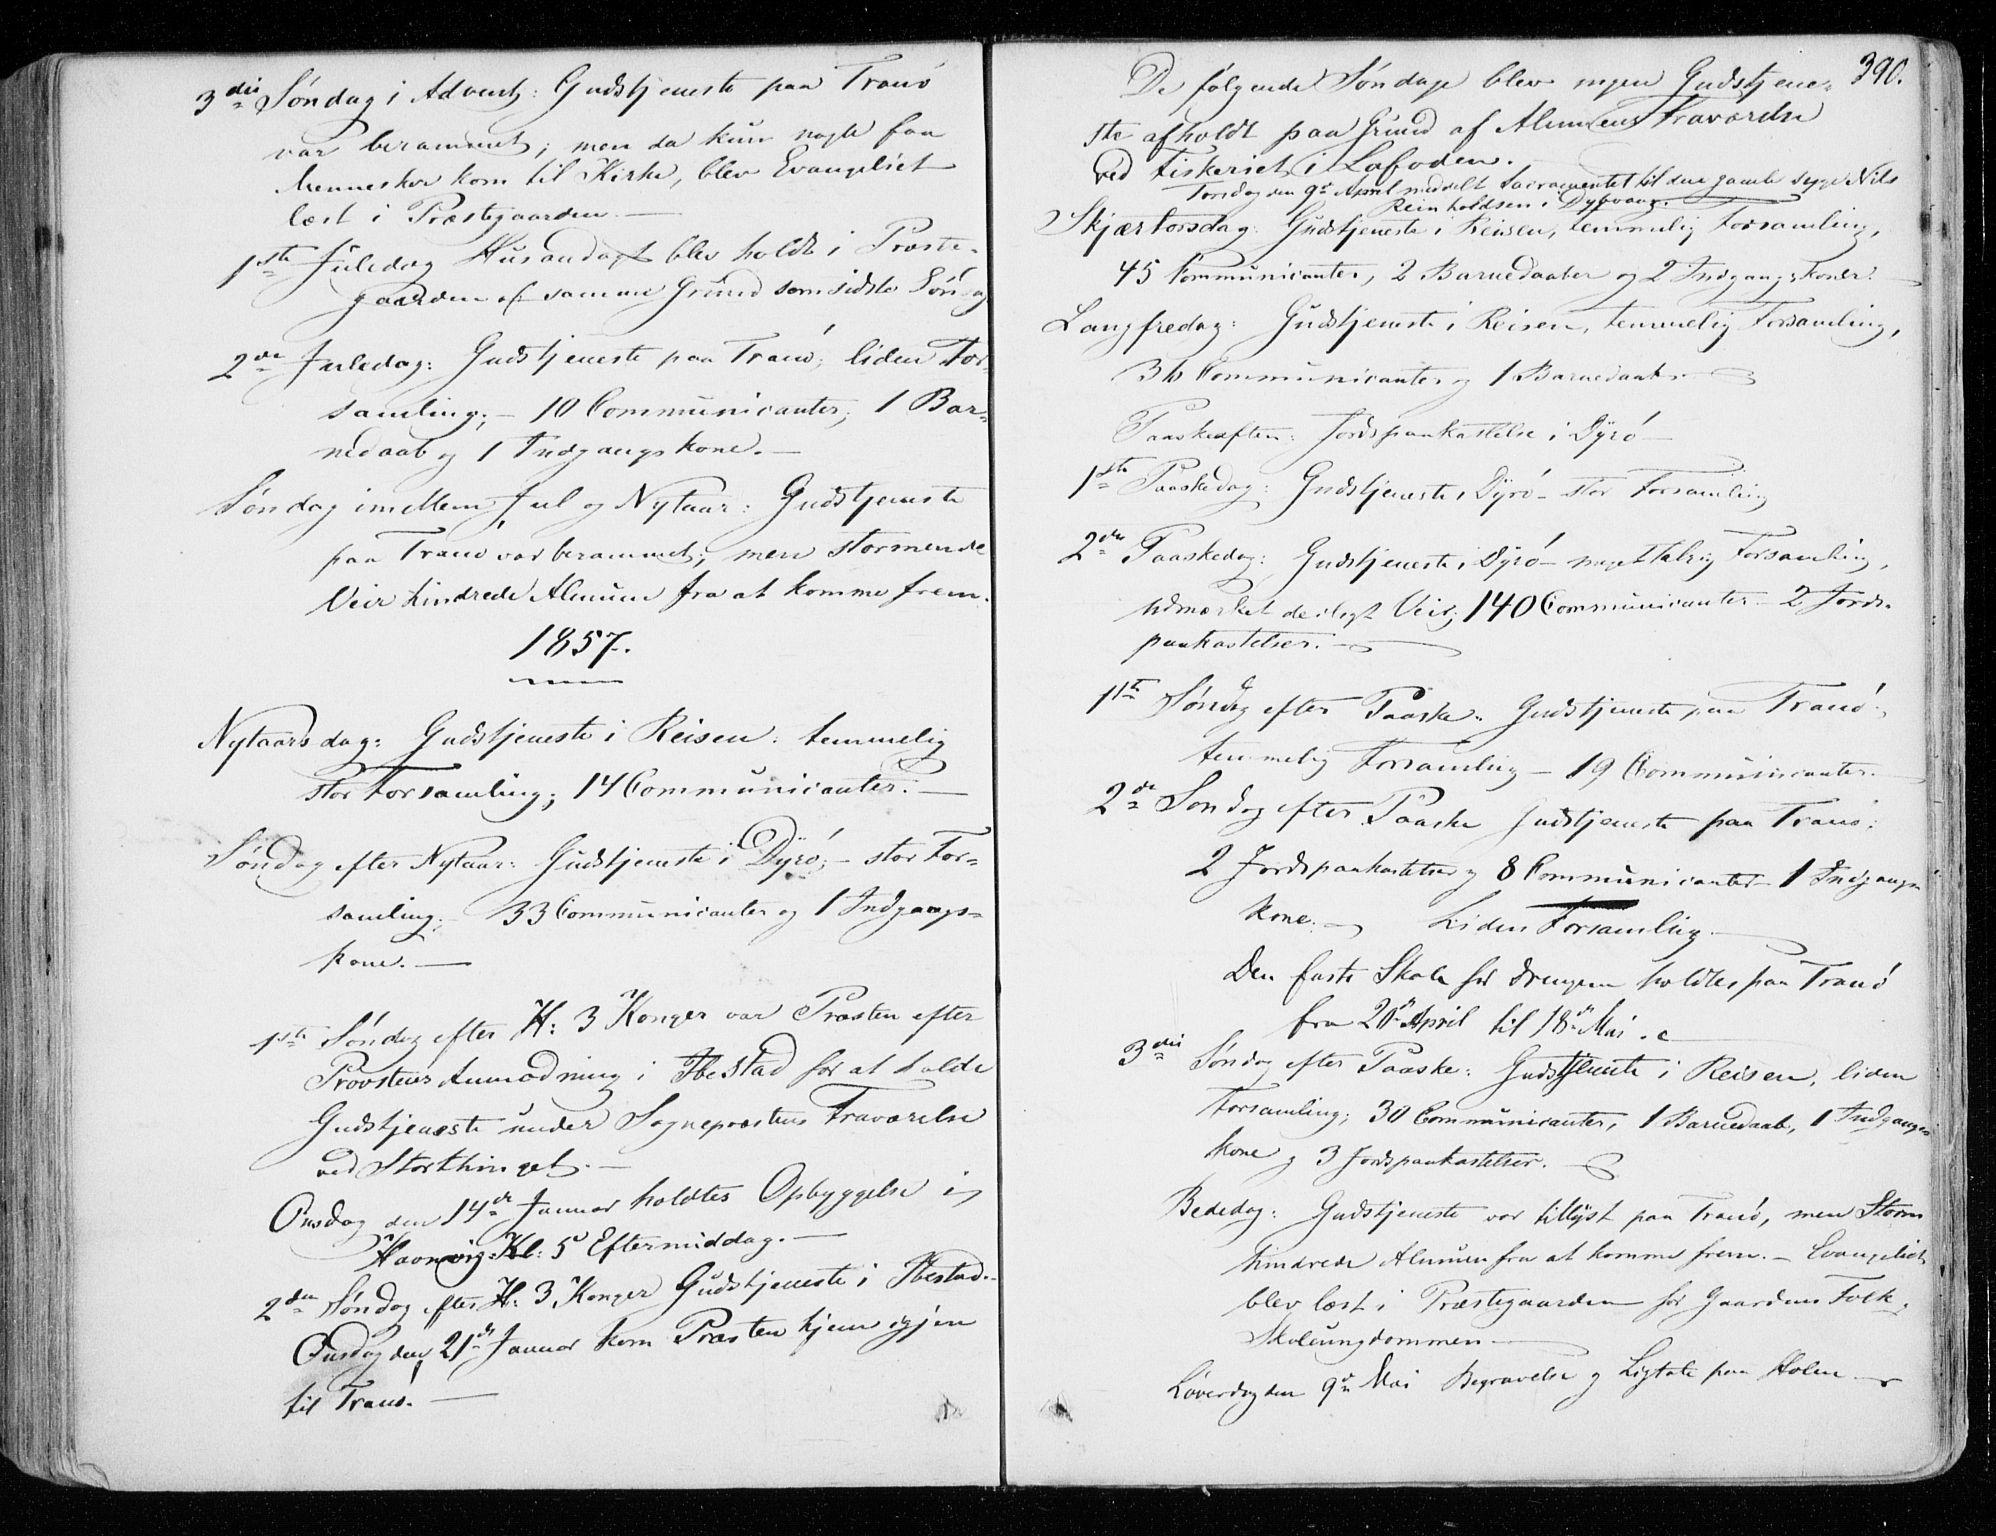 SATØ, Tranøy sokneprestkontor, I/Ia/Iaa/L0007kirke: Ministerialbok nr. 7, 1856-1866, s. 390